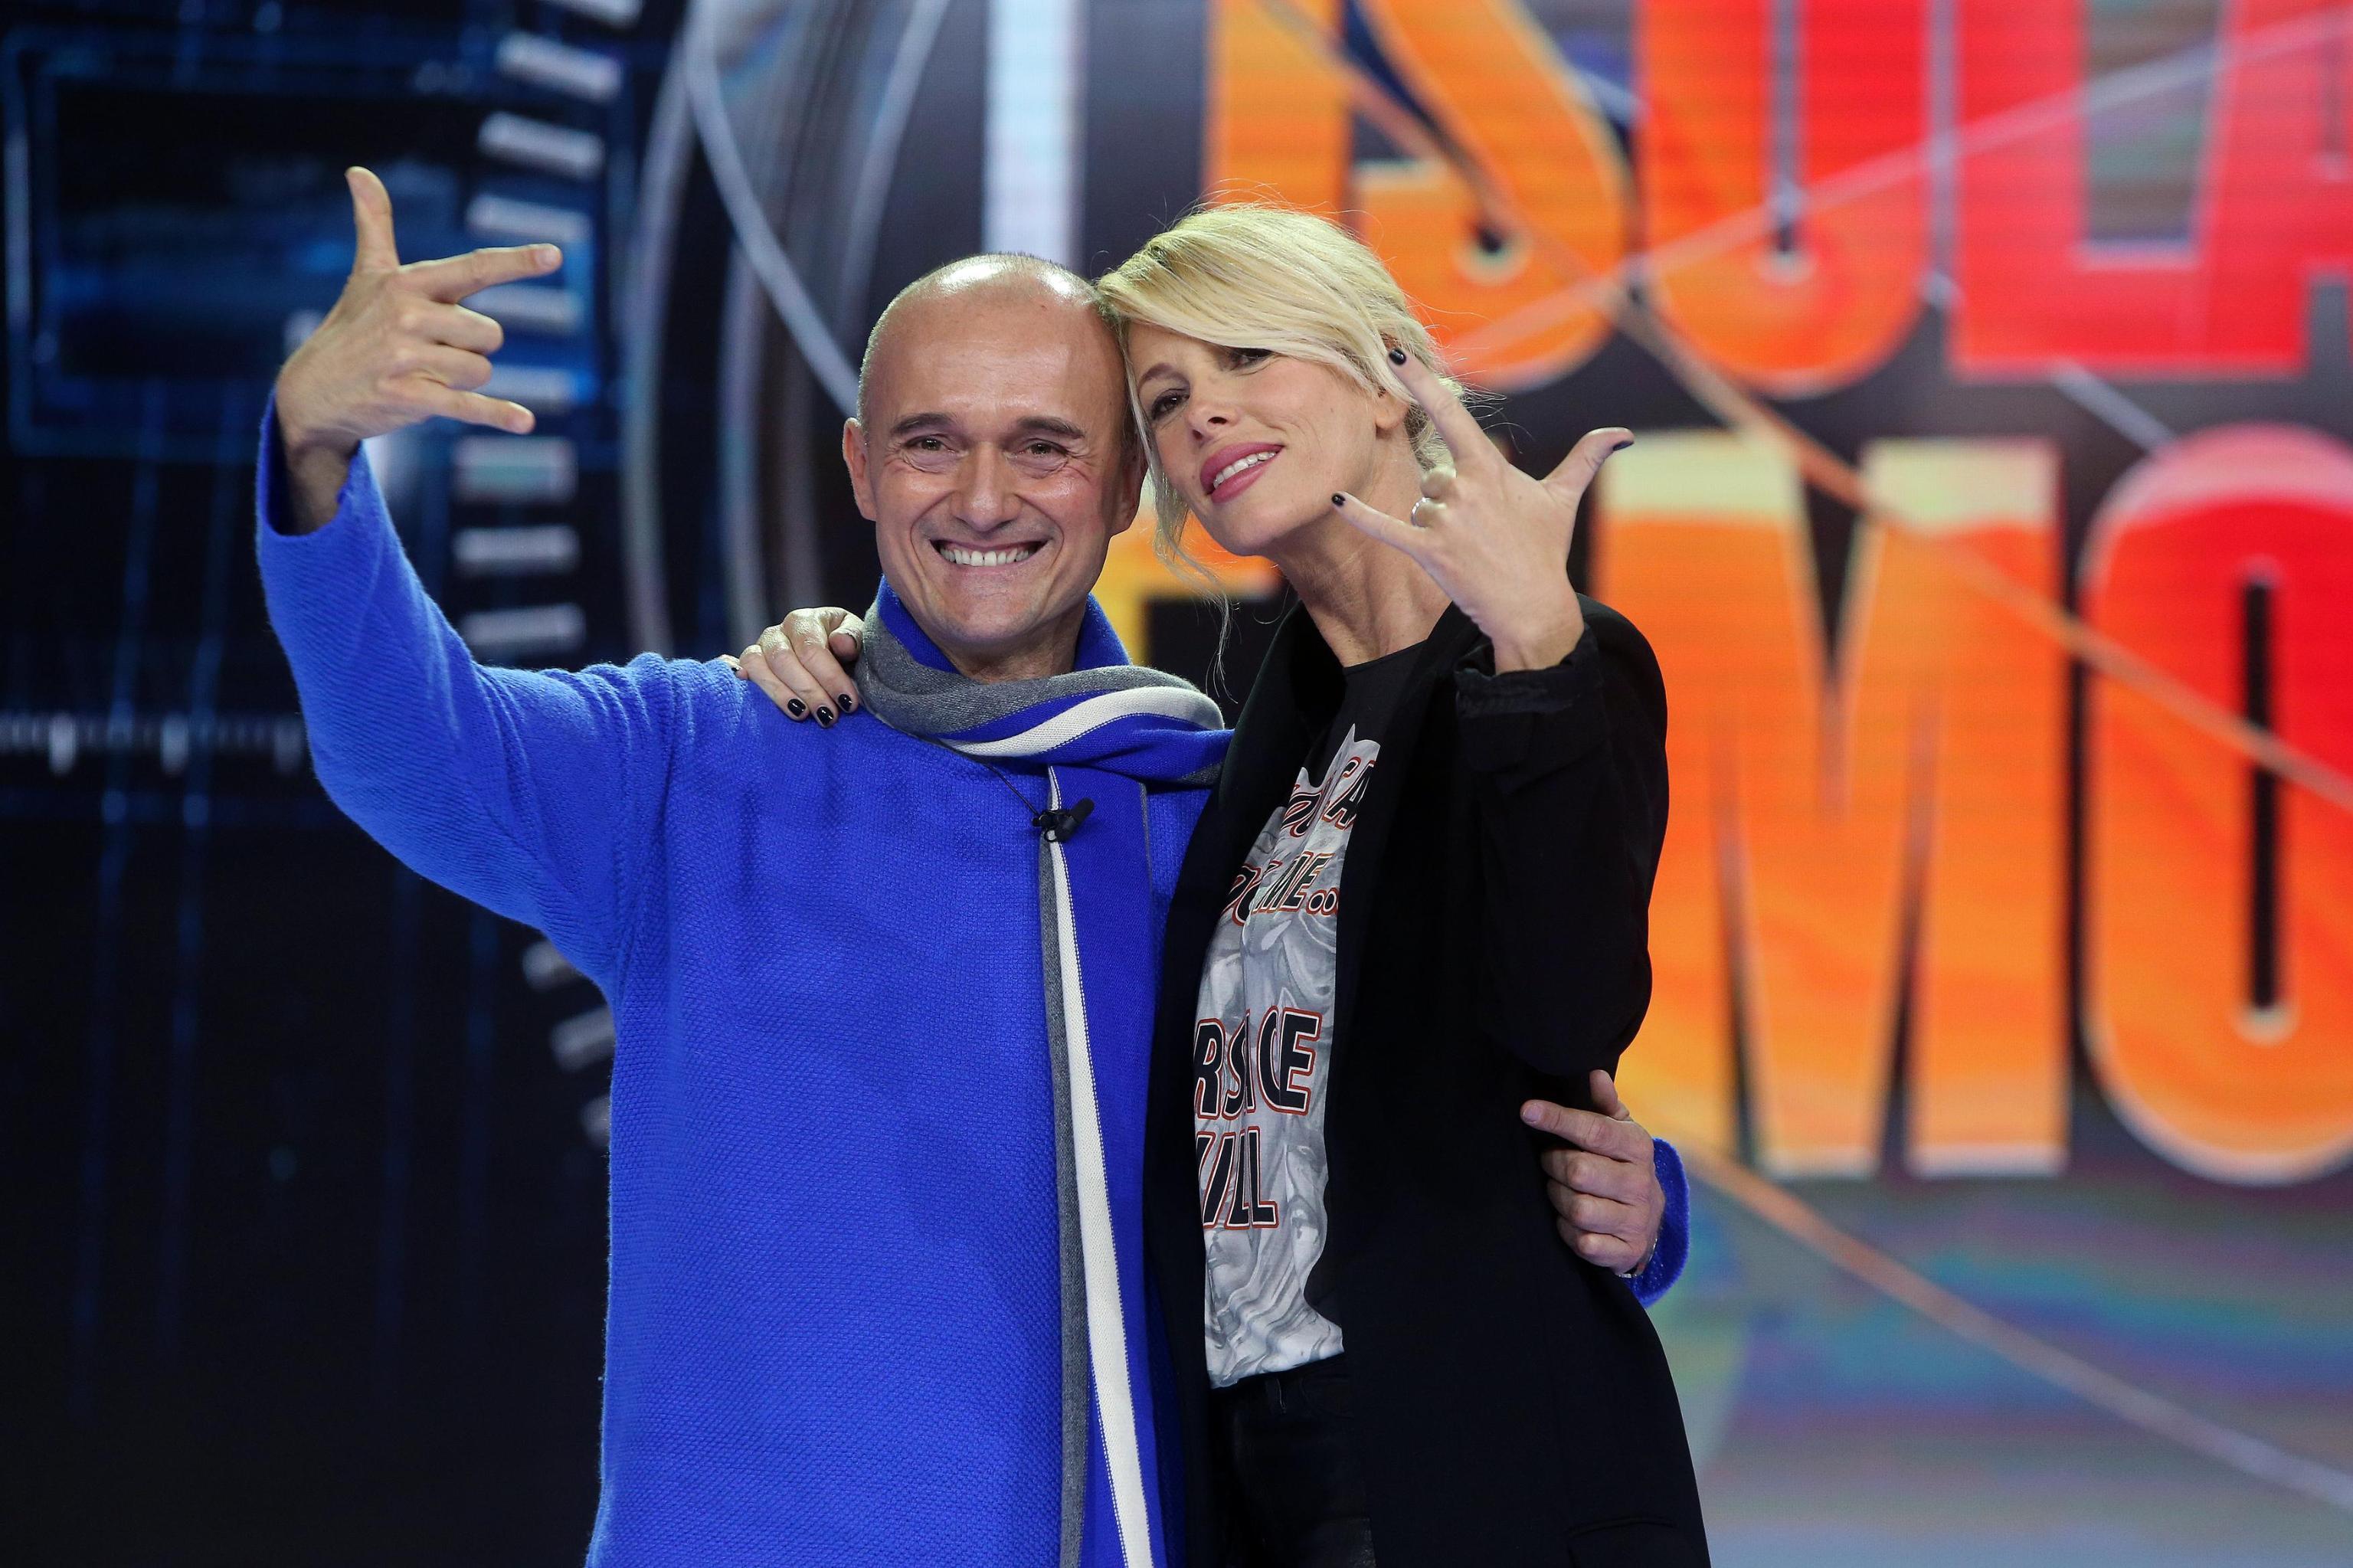 Alfonso Signorini: 'Da Eva Henger accuse pesanti e ingiustificate su Francesco Monte'